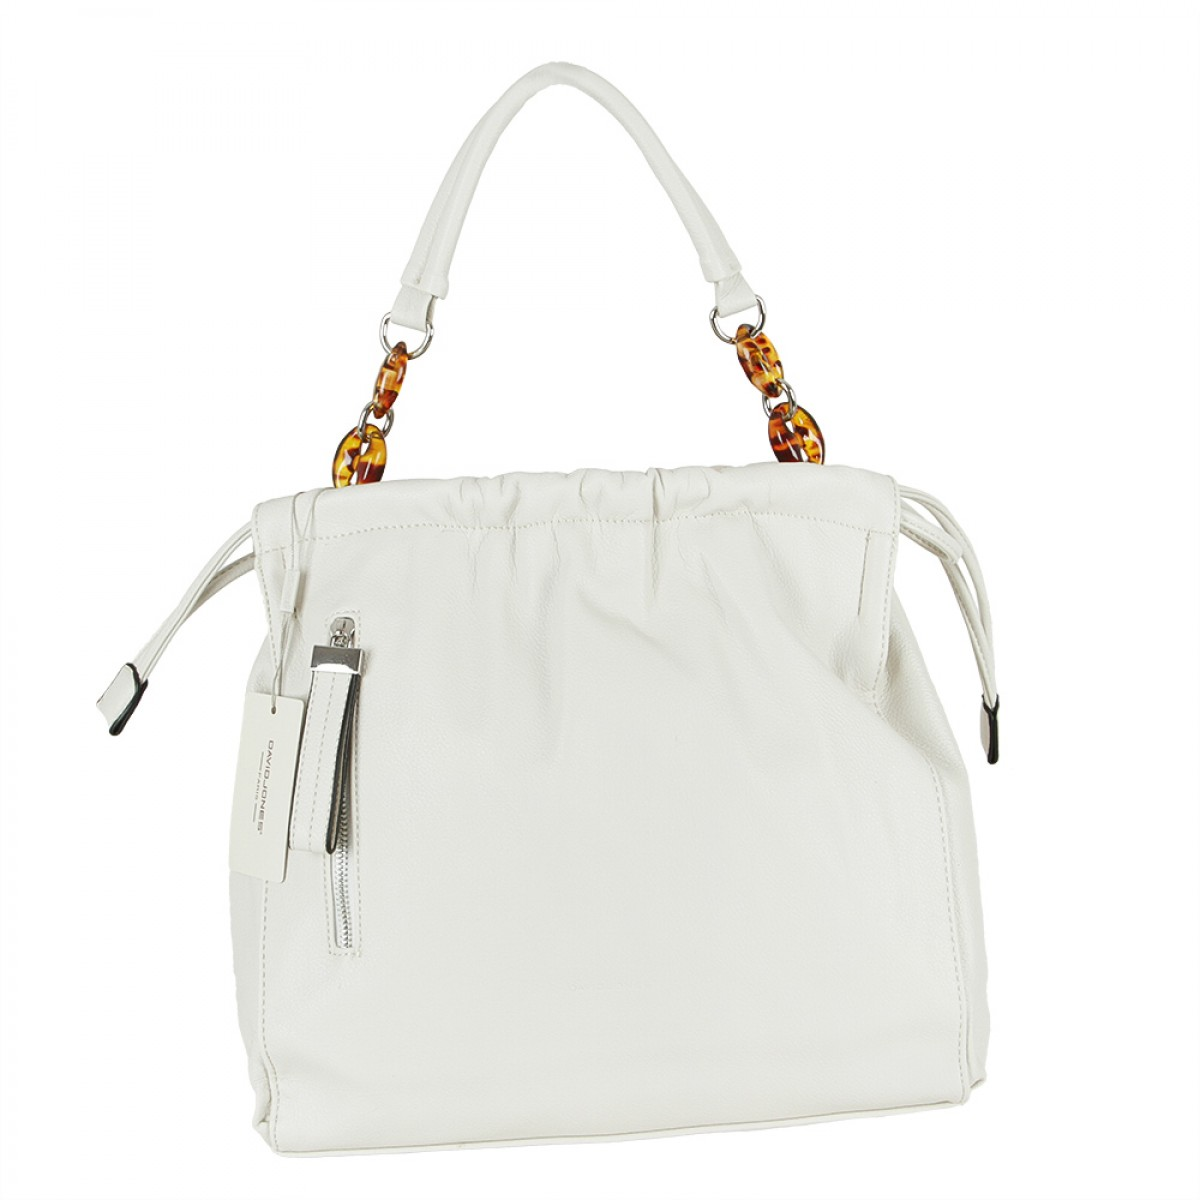 Жіноча сумка David Jones 6319-3 WHITE